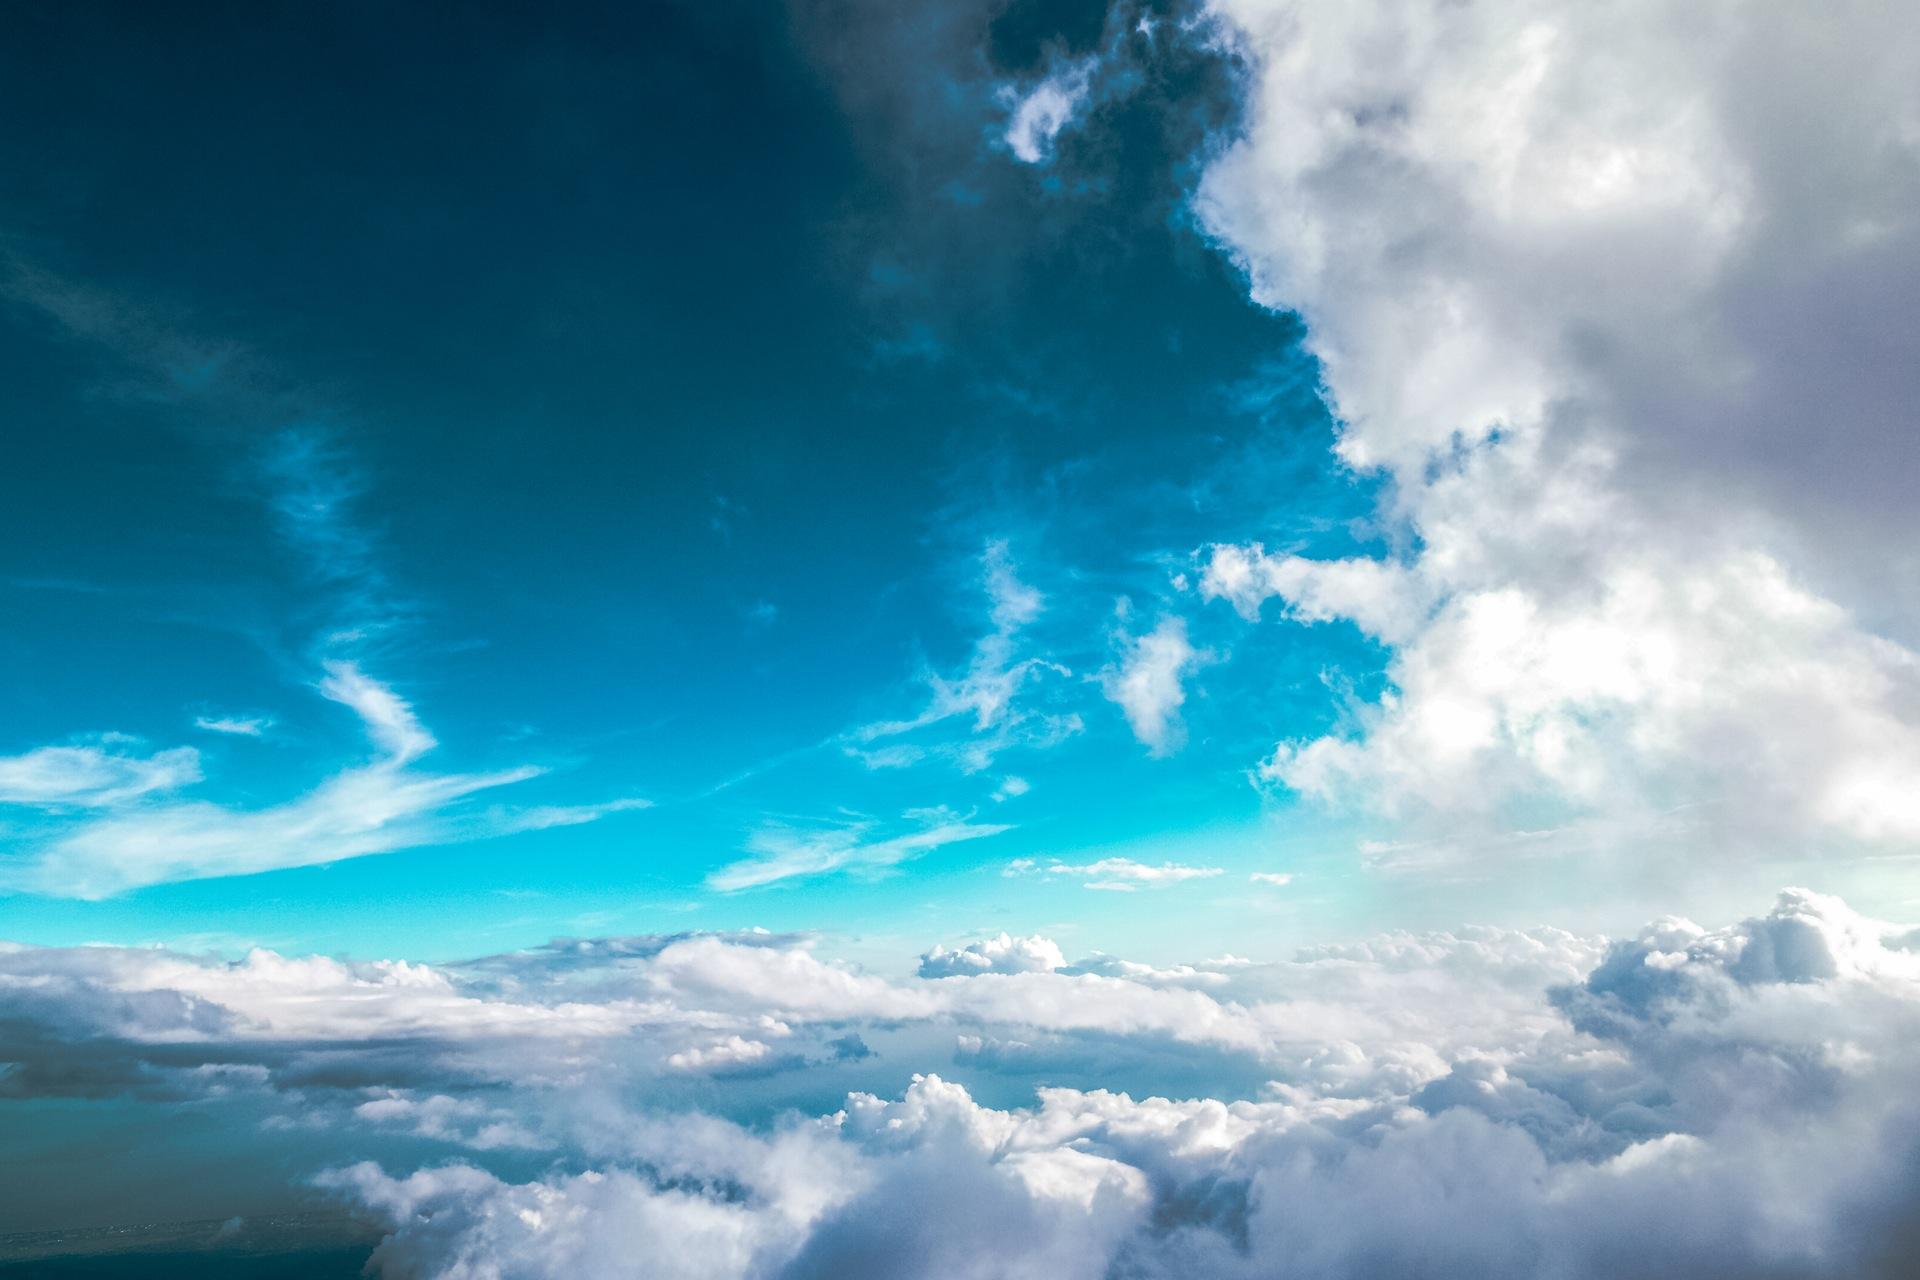 cielo, volar, nubes, azul, relax, paz, tranquilidad - Fondos de Pantalla HD - professor-falken.com